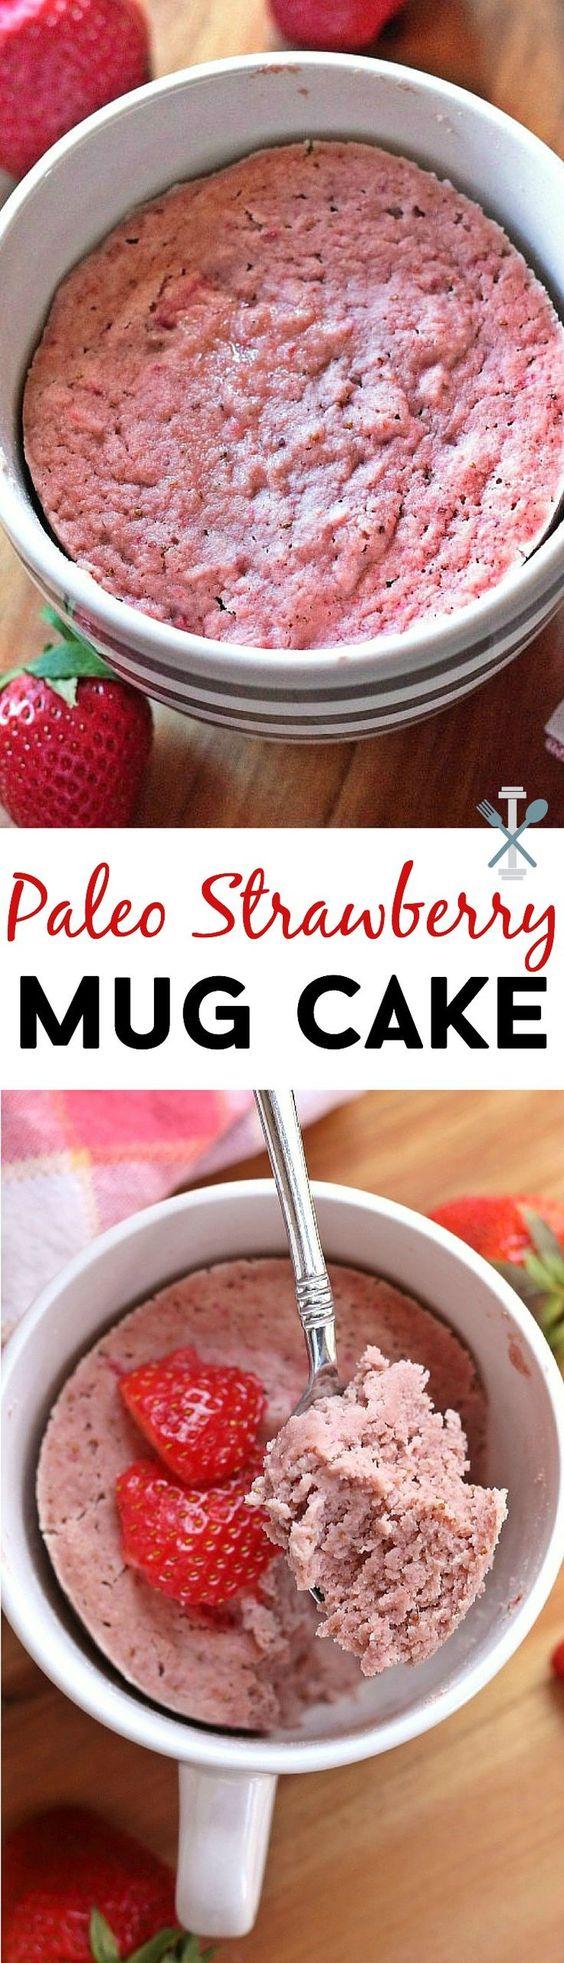 stawberry mug cake - paleo, vegan, gluten free